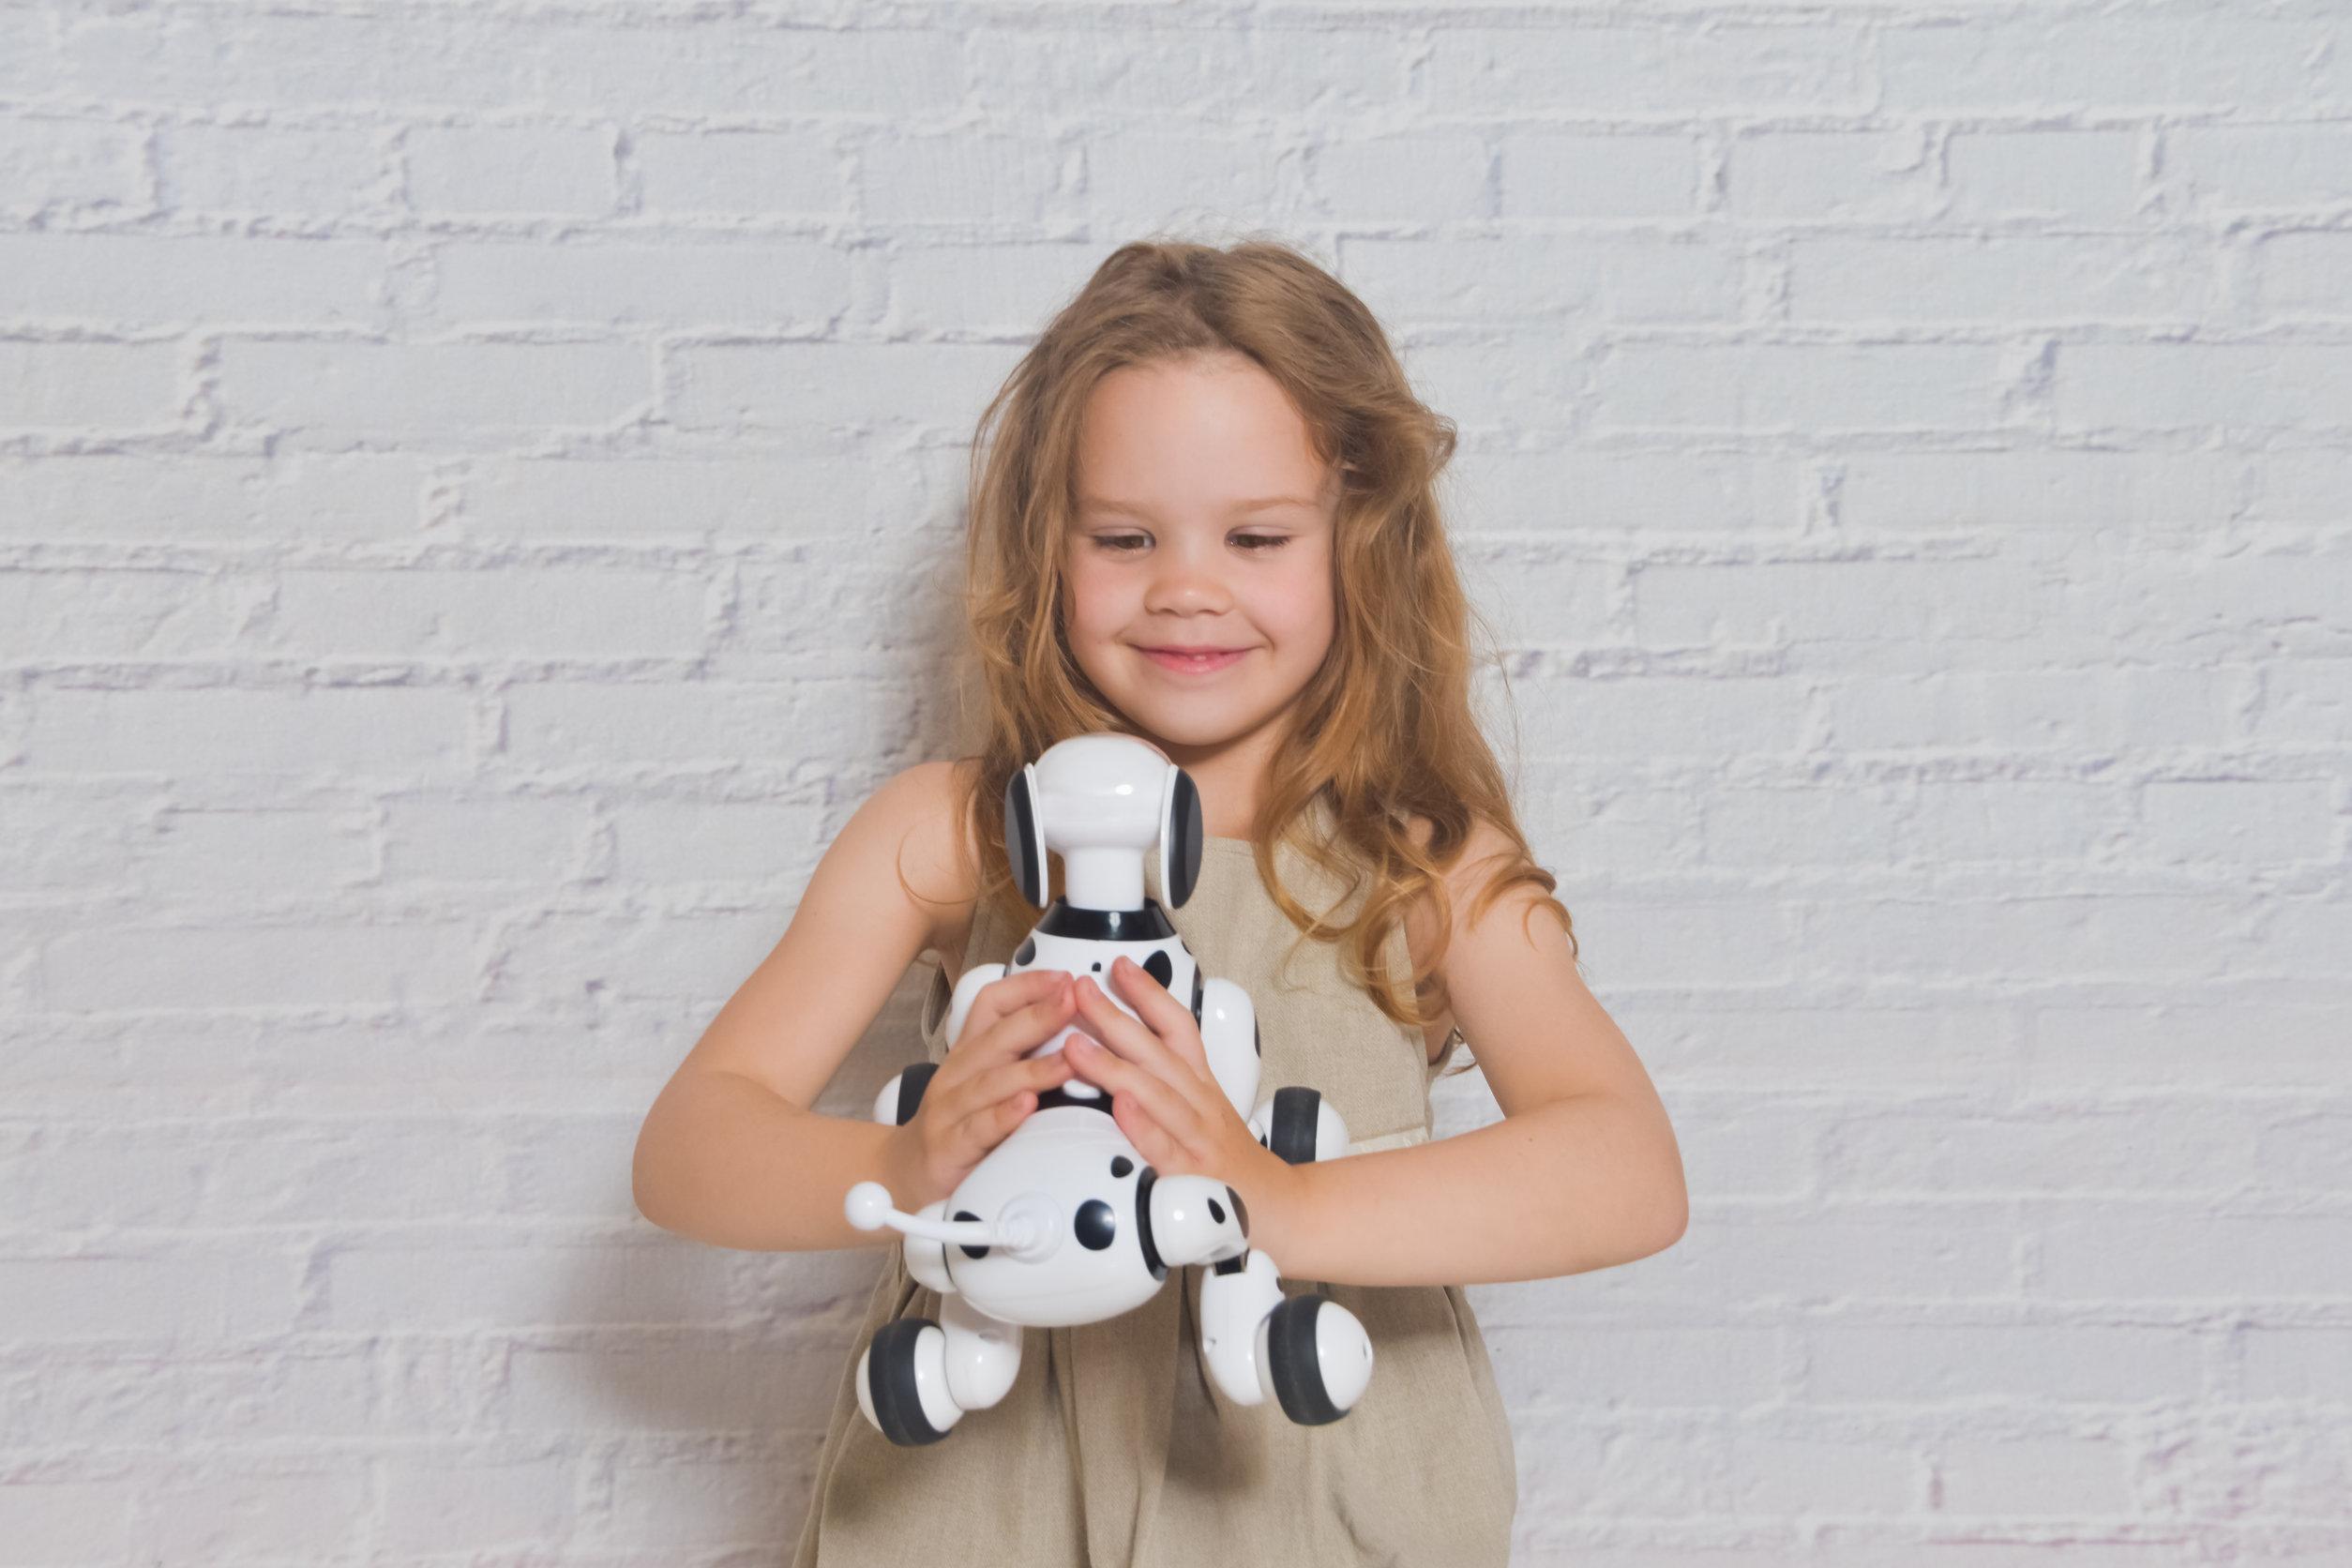 Niña jugando se encarga del perro robot